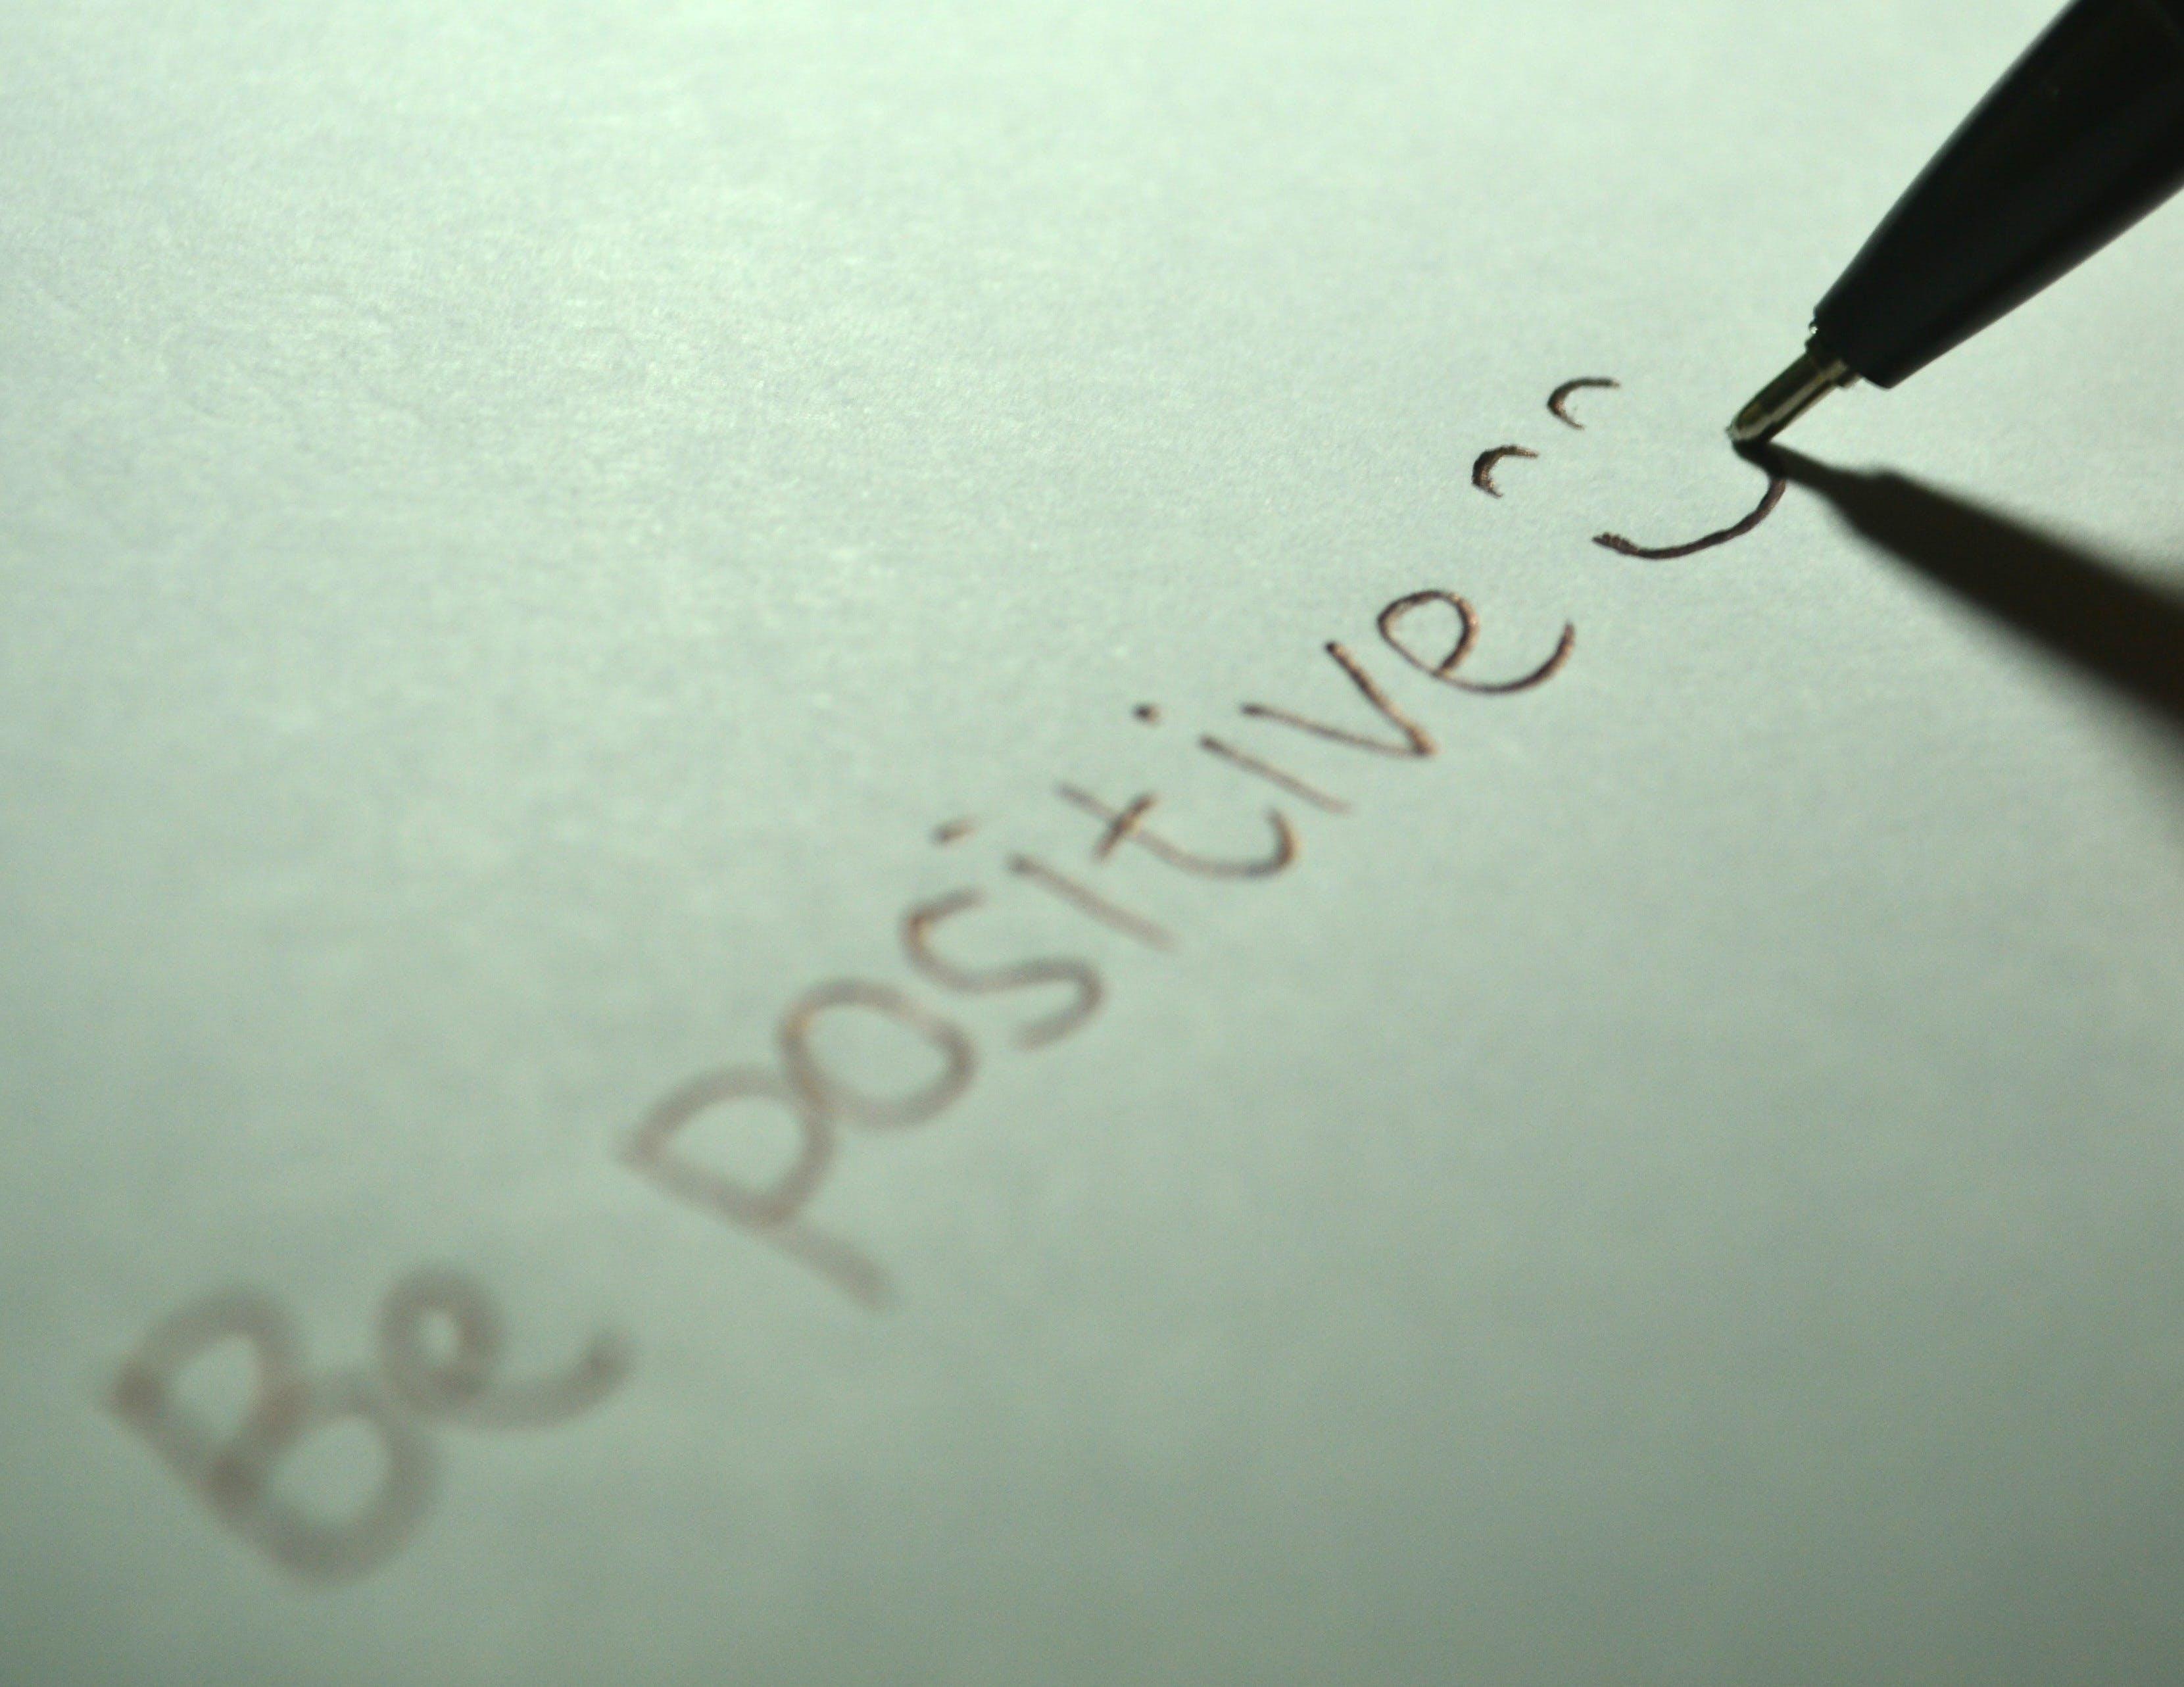 attitude, be positive, draw